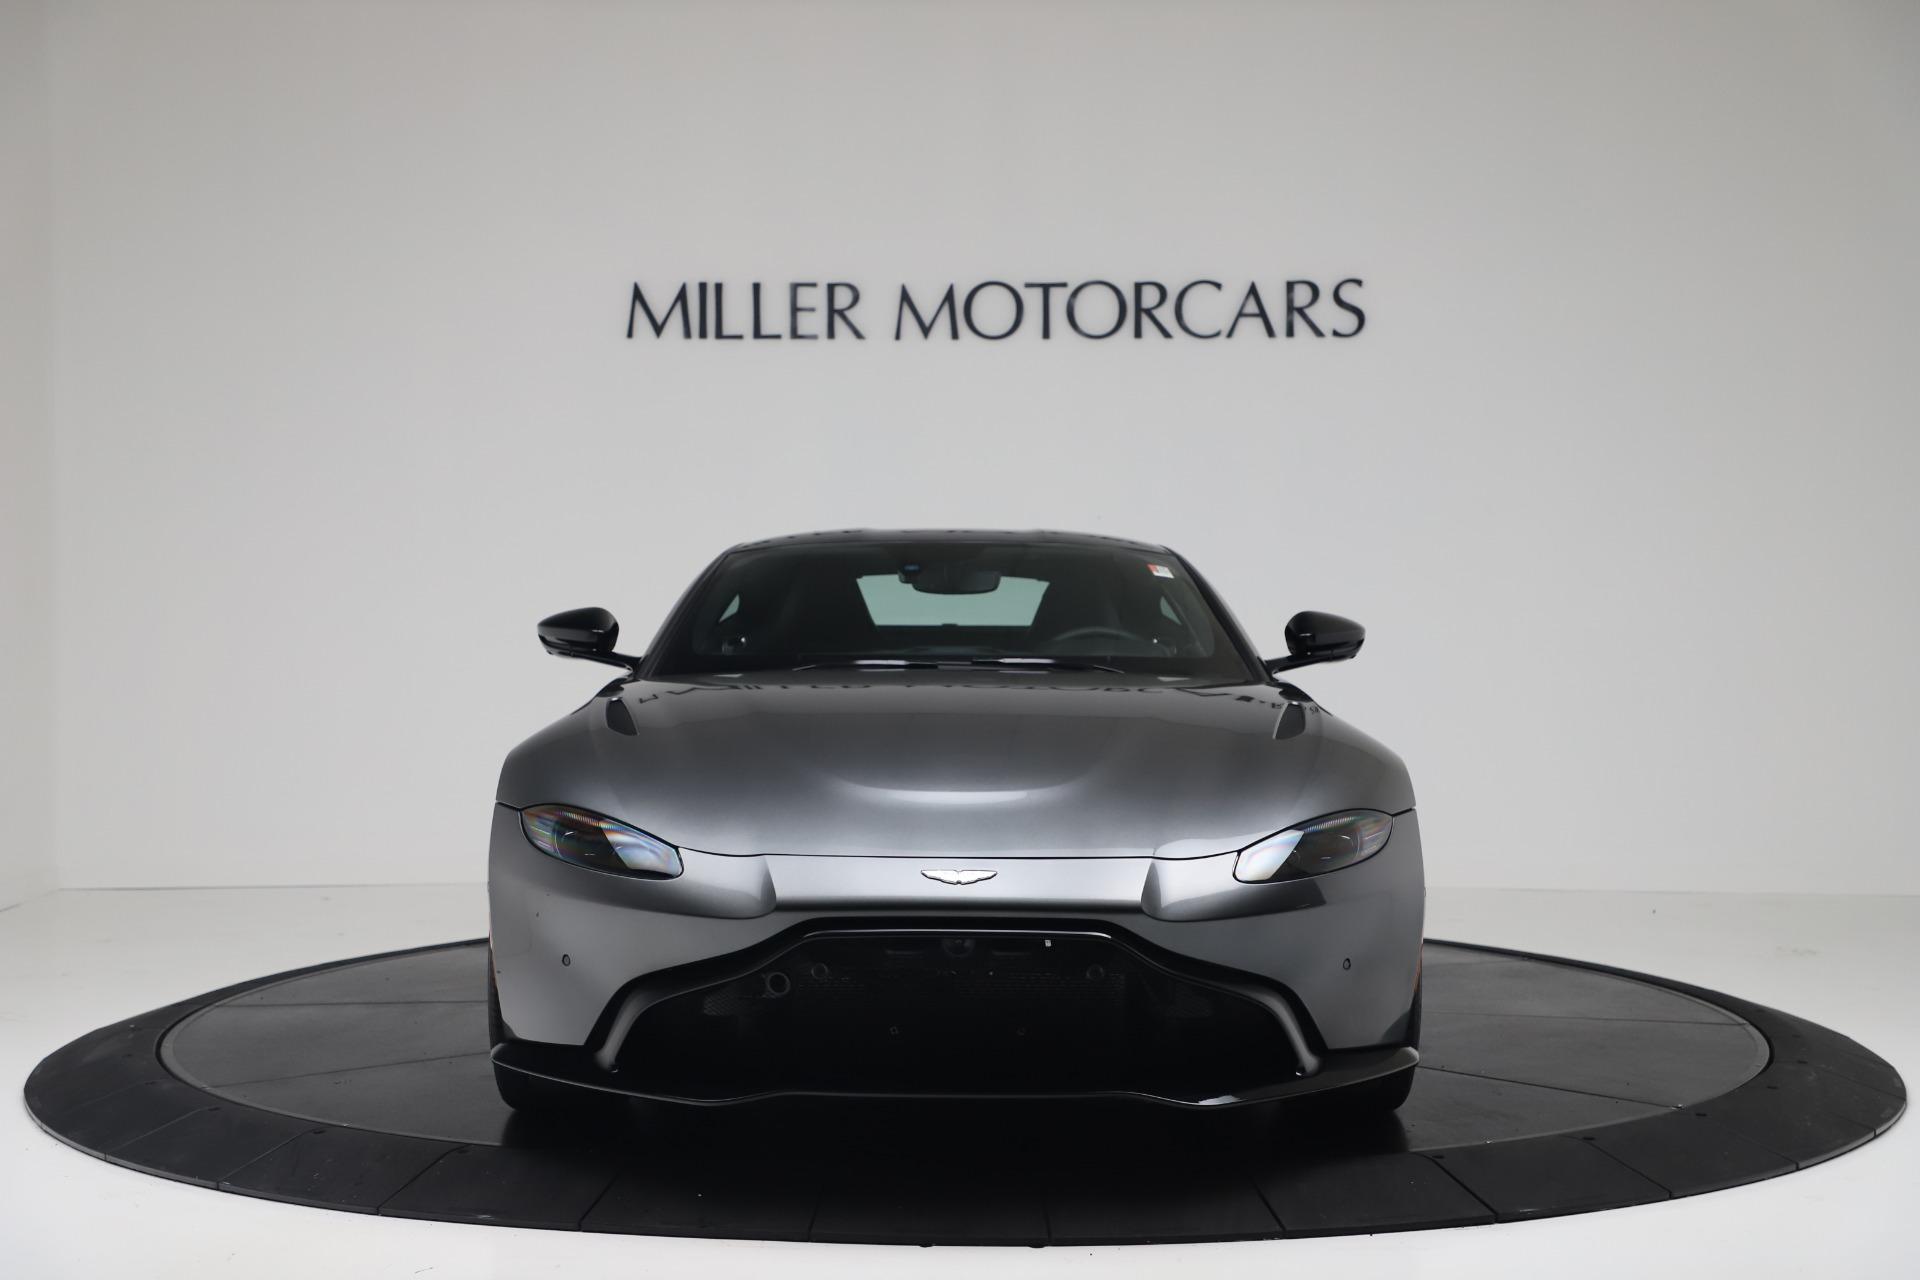 New 2020 Aston Martin Vantage V8 For Sale In Greenwich, CT 3408_p2